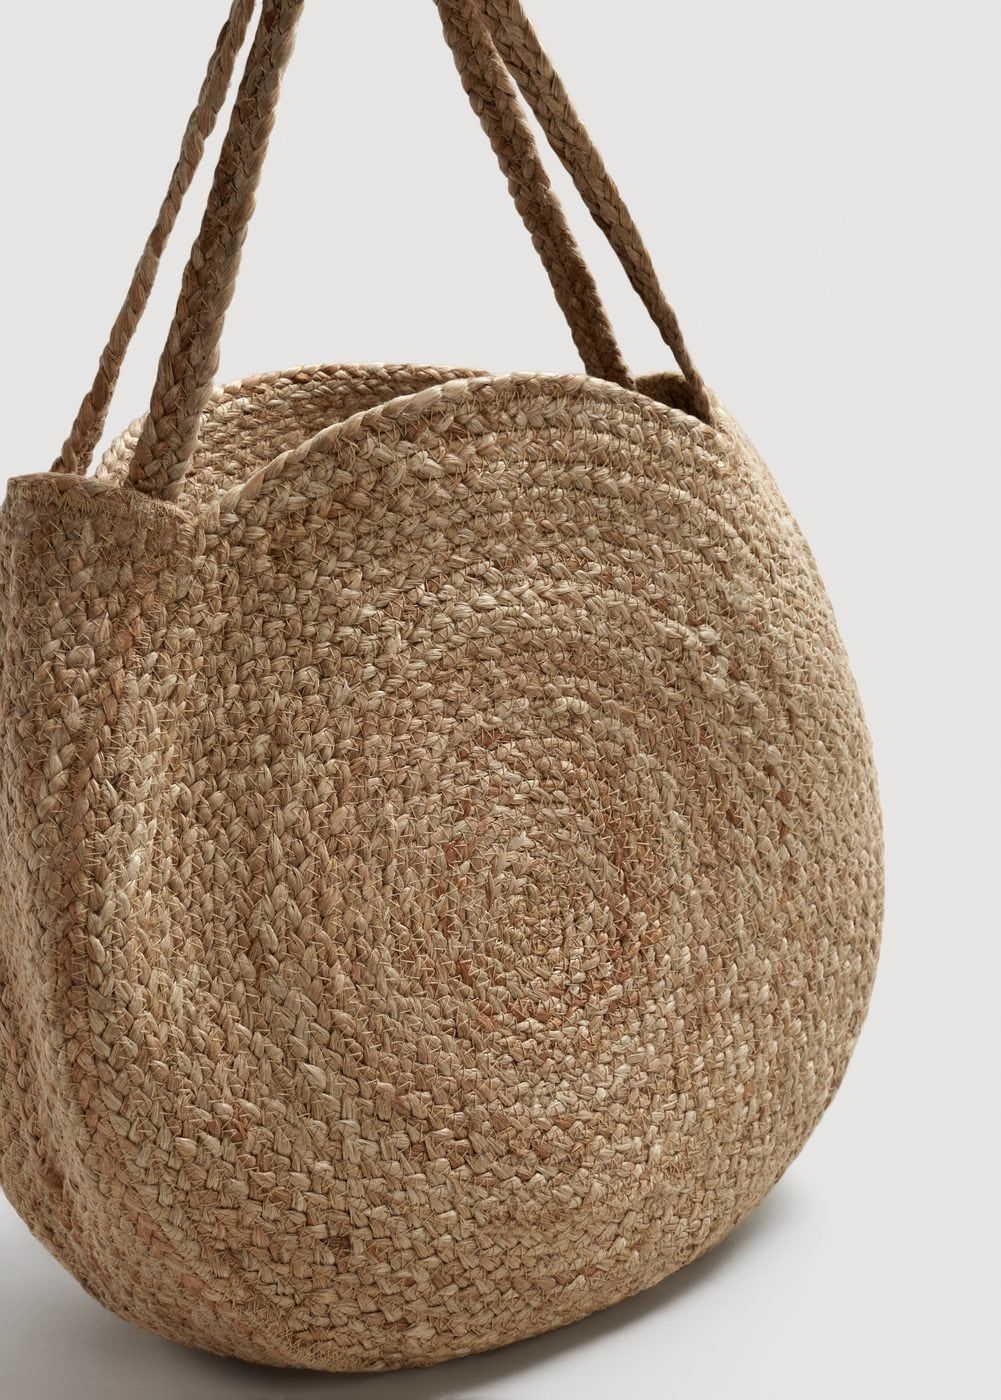 hight resolution of large jute fabric double handles decorative seams straw bag bags fashion handbags